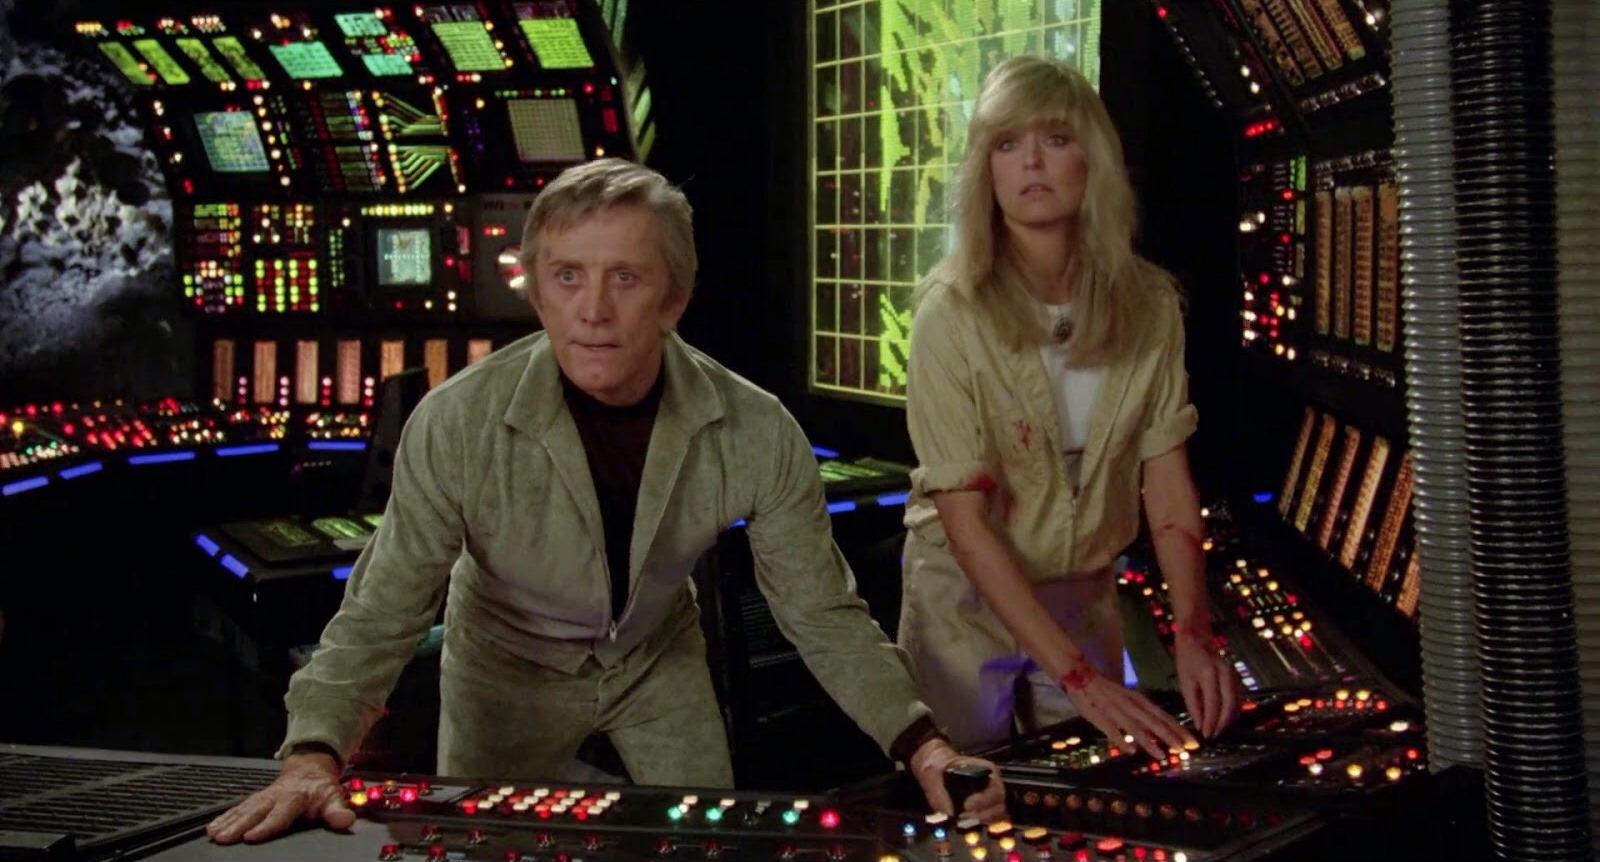 Adam (Kirk Douglas) and Alex (Farrah Fawcett) - lovers manning a station on Saturn's moon Triton in Saturn 3 (1980)